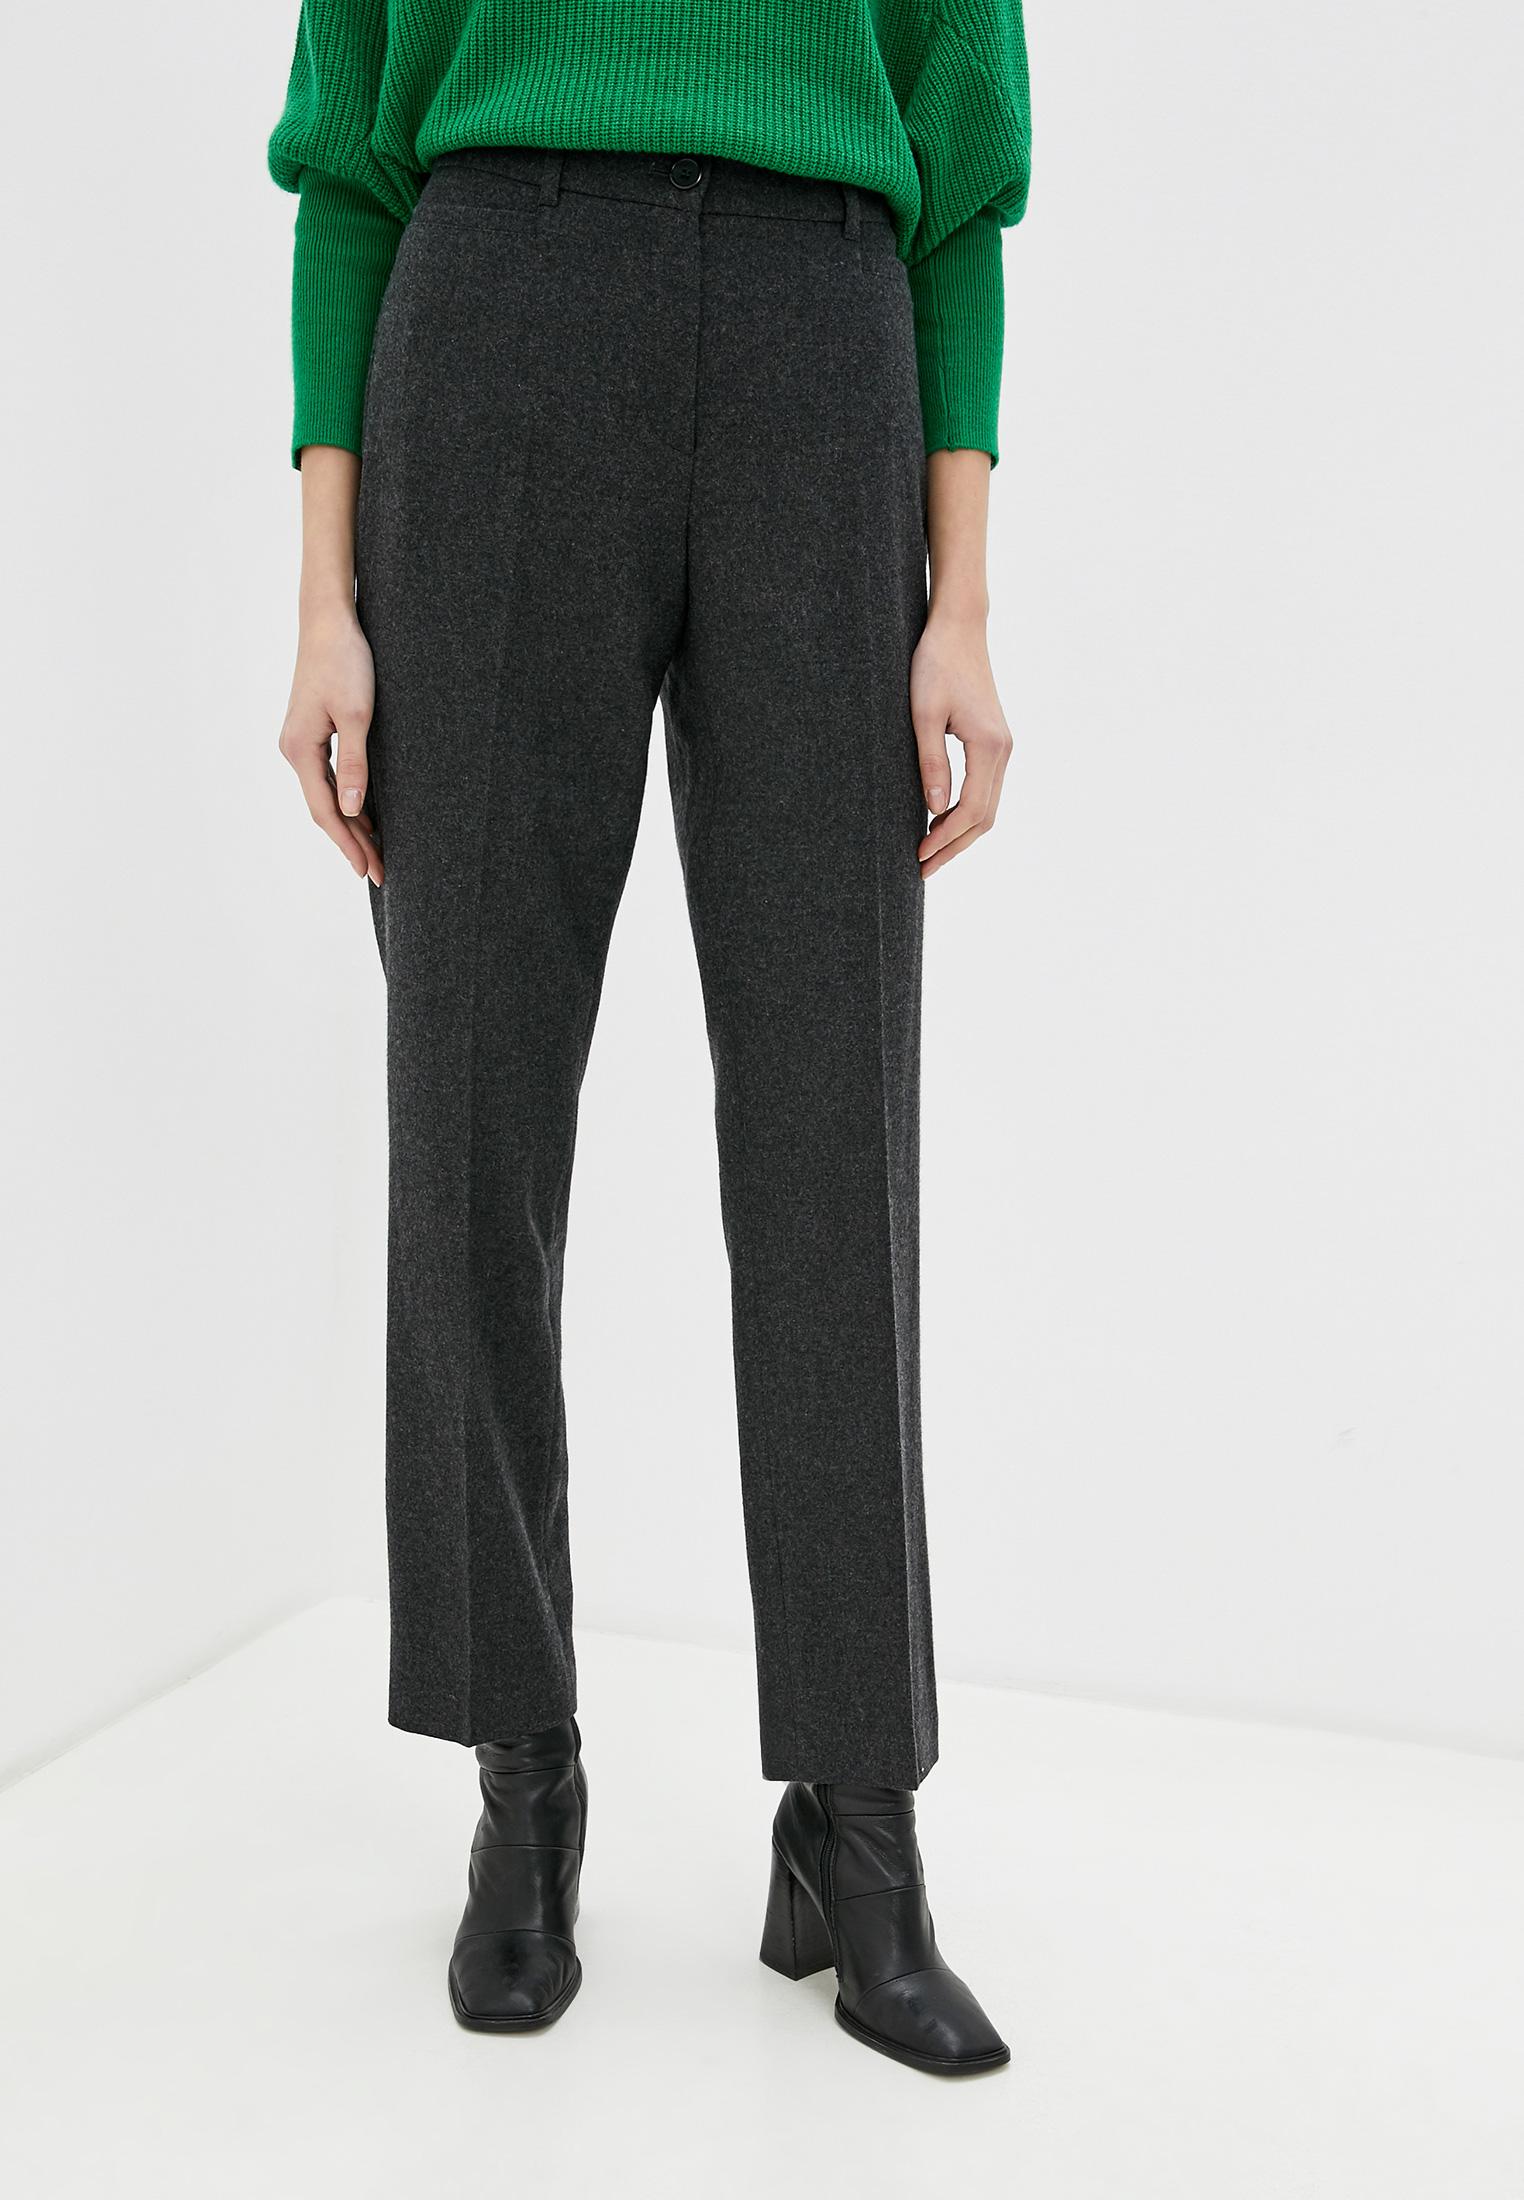 Женские классические брюки Gerry Weber (Гарри Вебер) 122071-67898